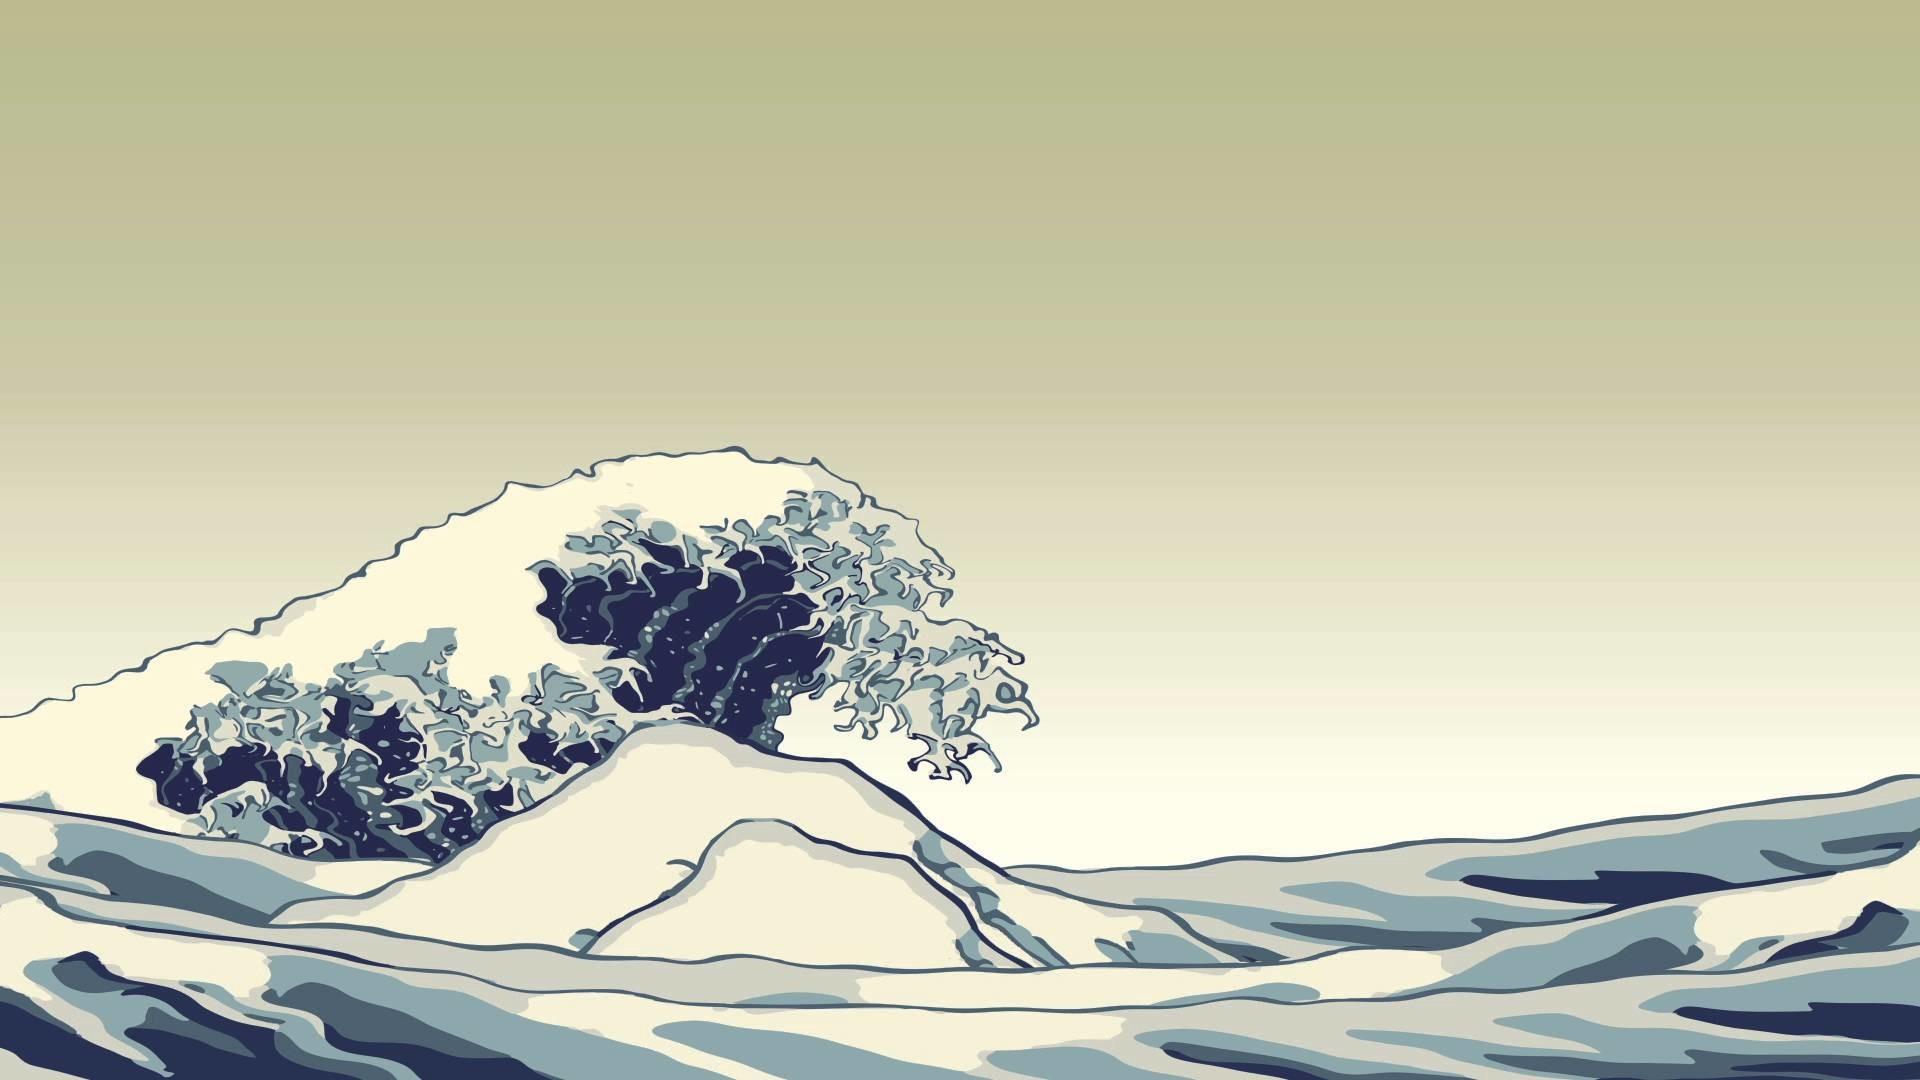 Free Falling Snow Wallpaper Download Ukiyo E Wallpaper 183 ① Wallpapertag